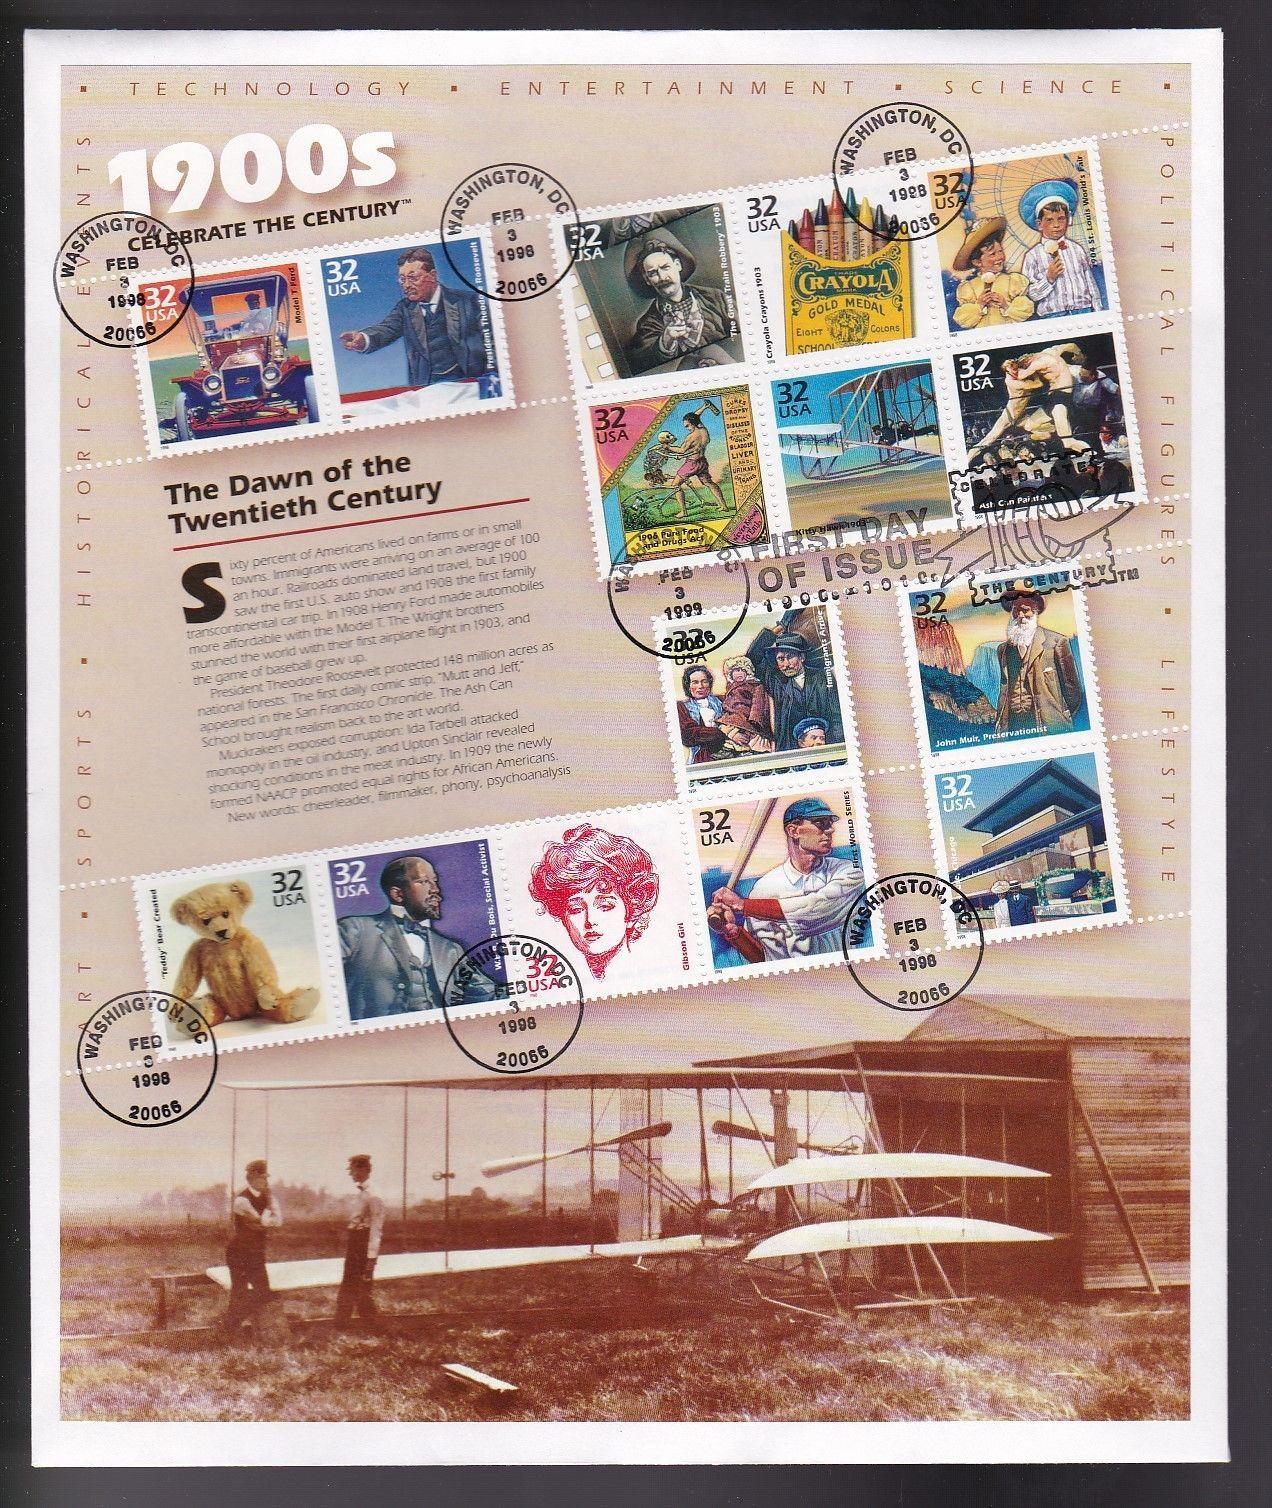 CELEBRTE THE CENTURY 1900's #3182a-o FULL SHEET FDC WASHINGTON DC 2/3/1998